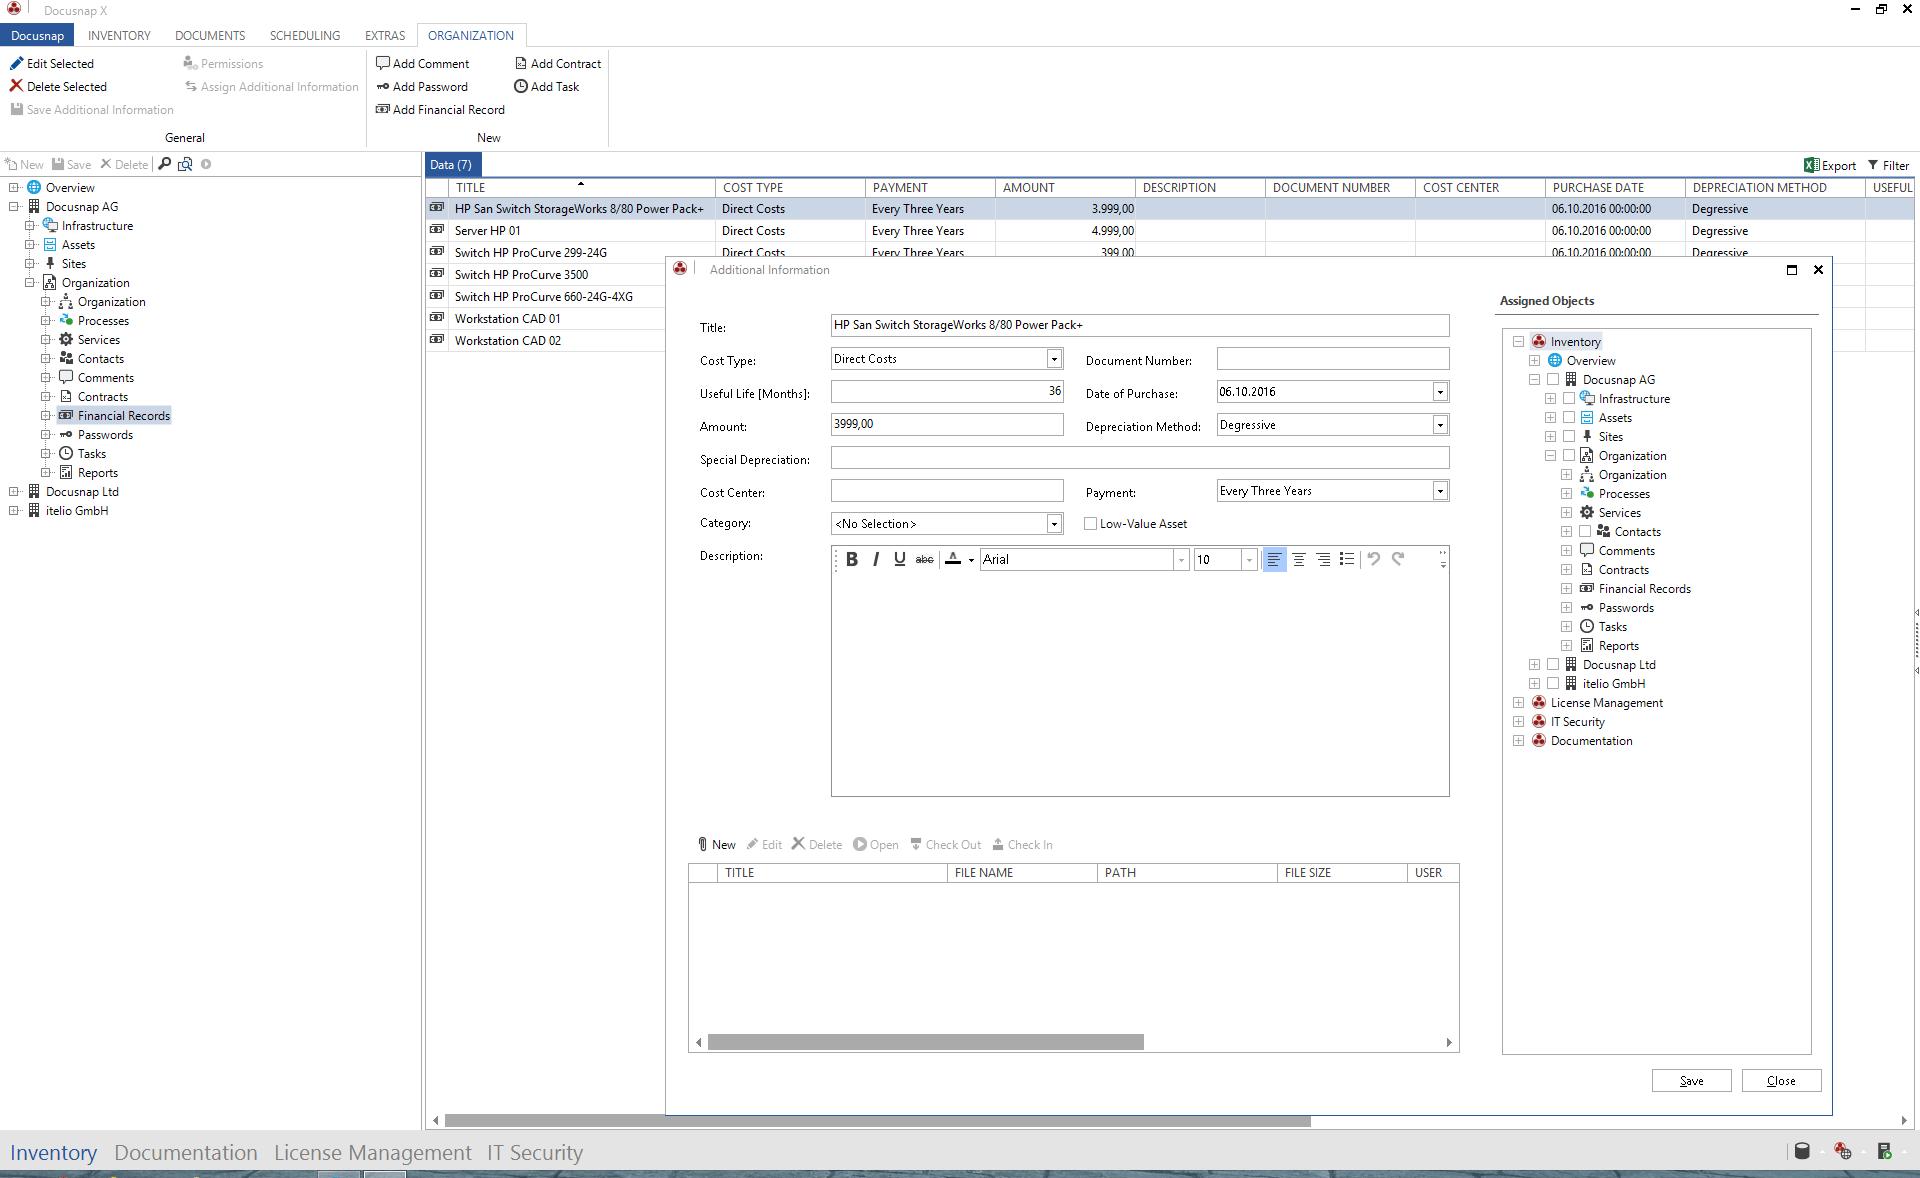 Screenshot: Financial Documents